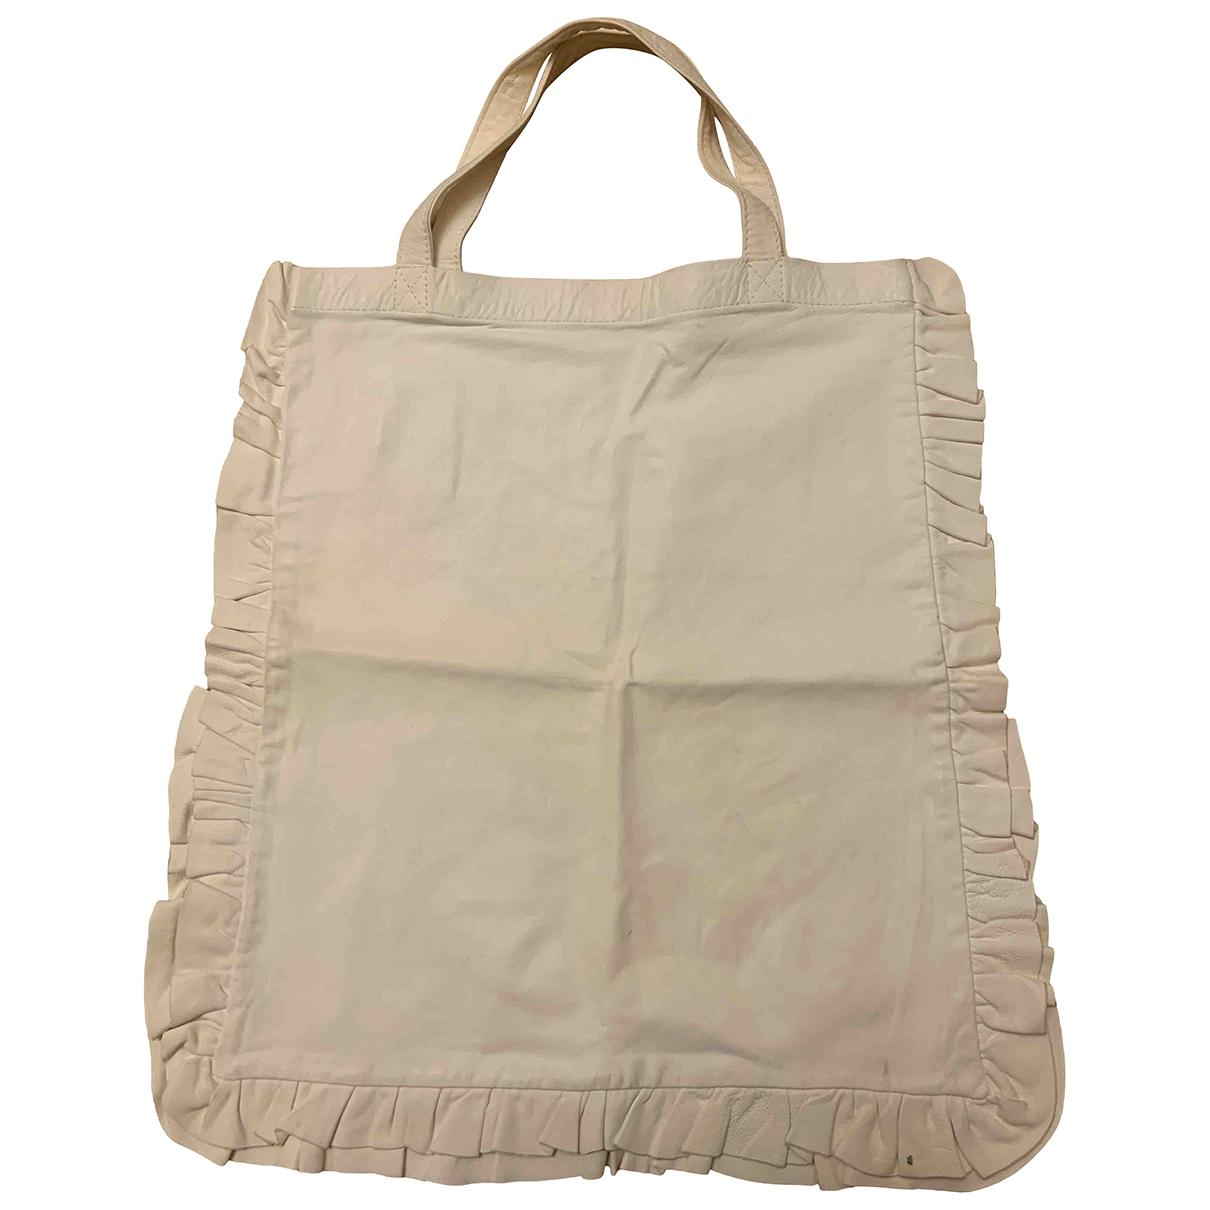 Comme Des Garcons \N White Leather handbag for Women \N